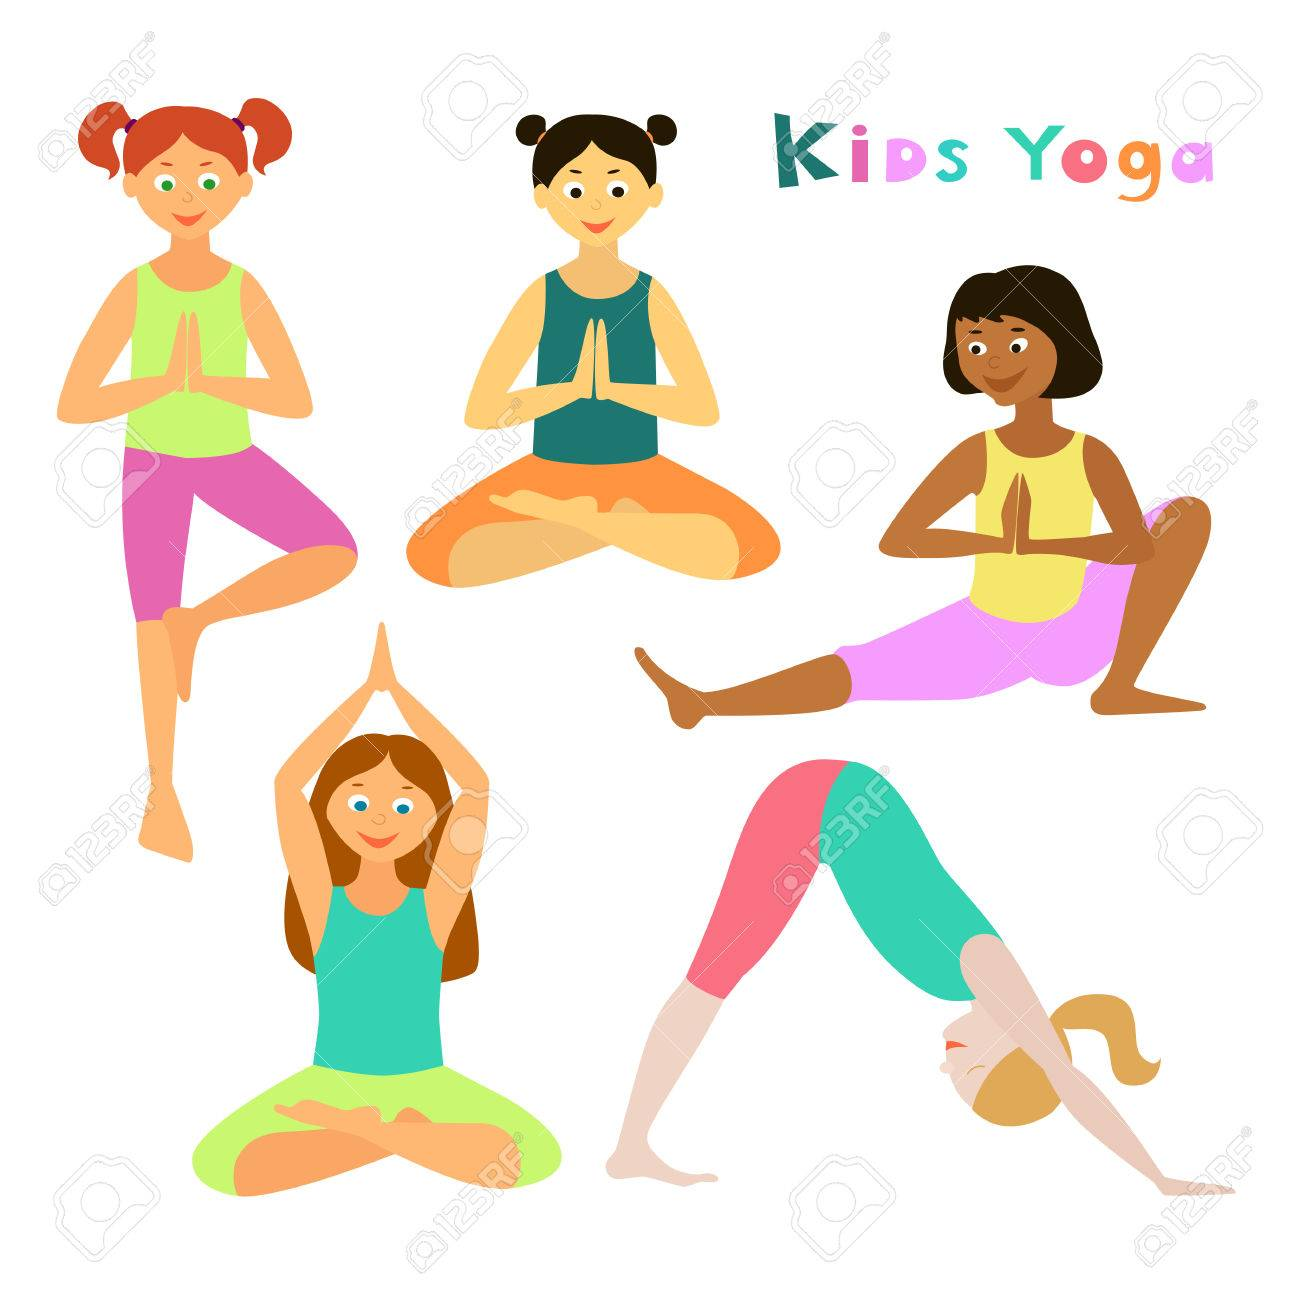 Kids Yoga Vector Illustration Asanas Set Of Yoga Poses Cartoon Royalty Free Cliparts Vectors And Stock Illustration Image 81002613